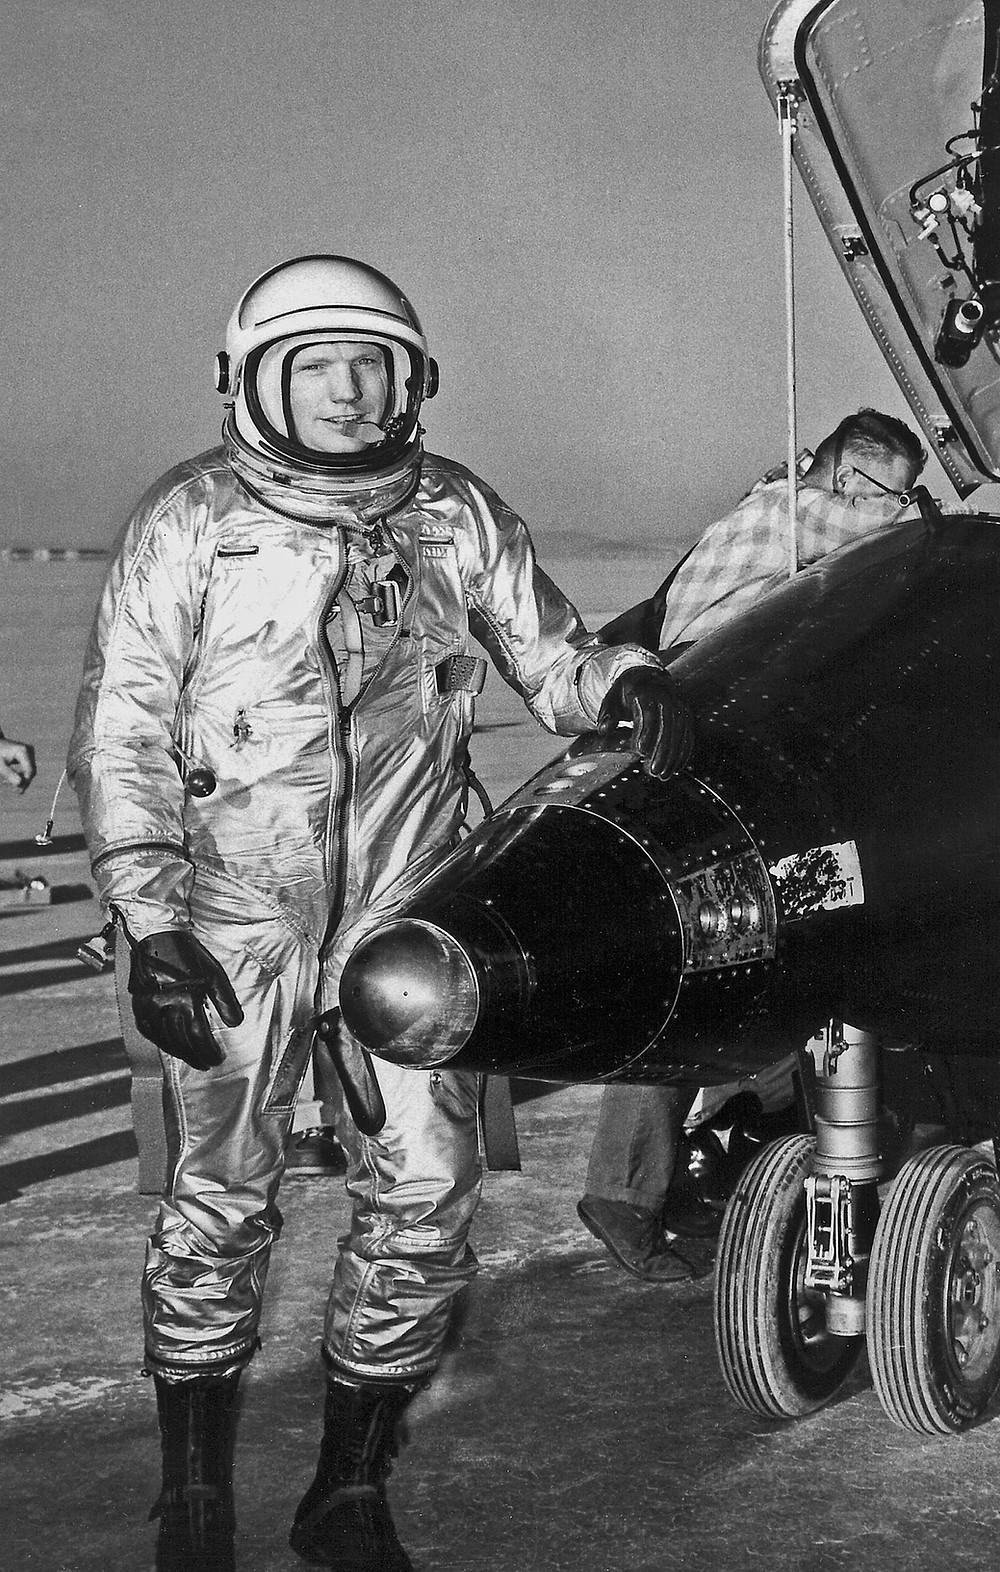 Astronaut Neil Armstrong as an X-15 pilot before becoming a NASA astronaut